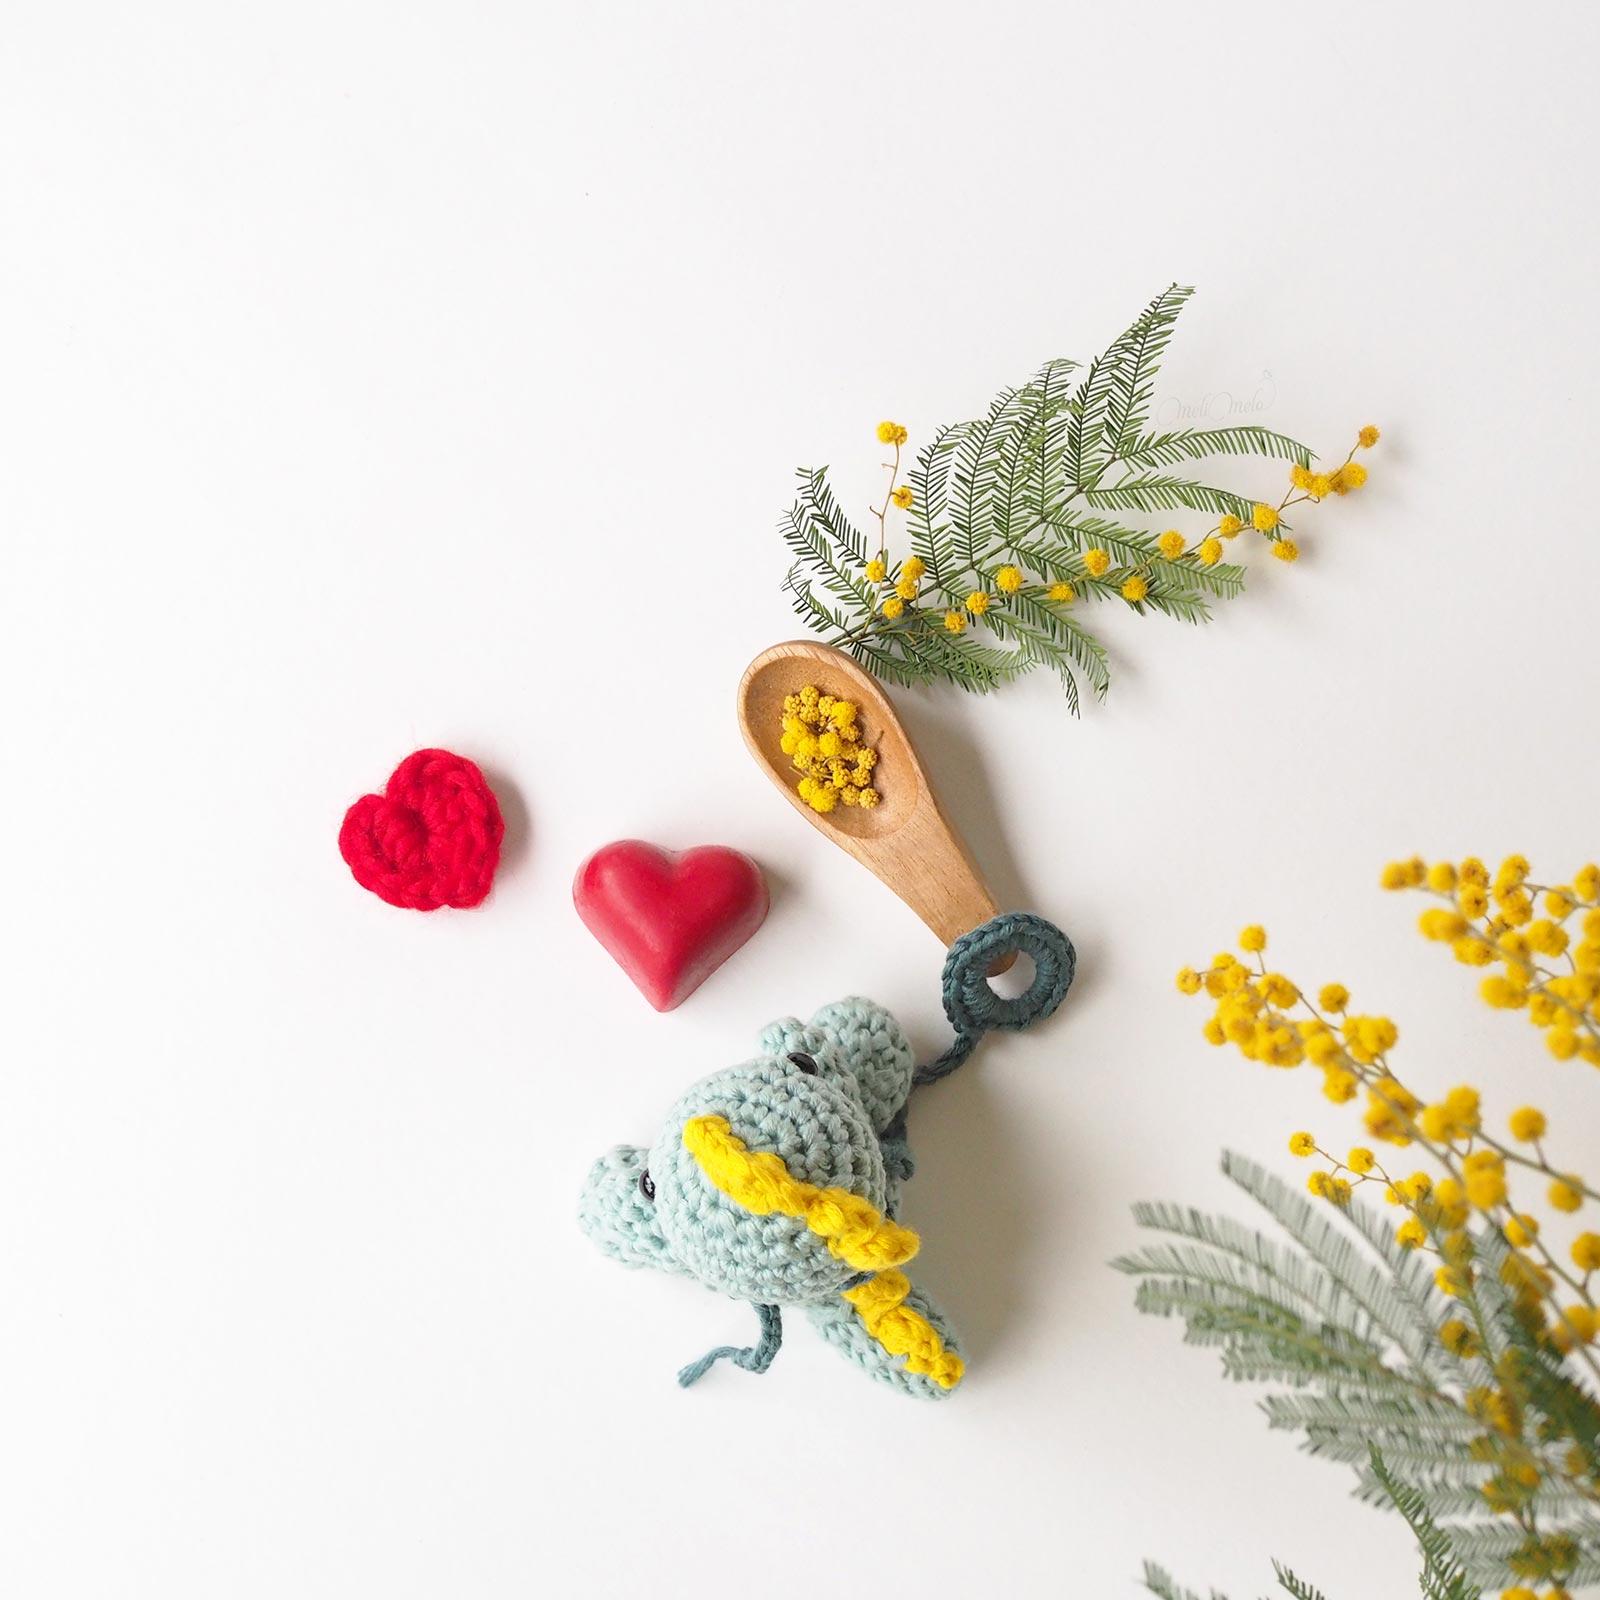 création mignonneries crochet bébé dino dinosaure mimosa love valentin cotton we are knitters laboutiquedemelimelo